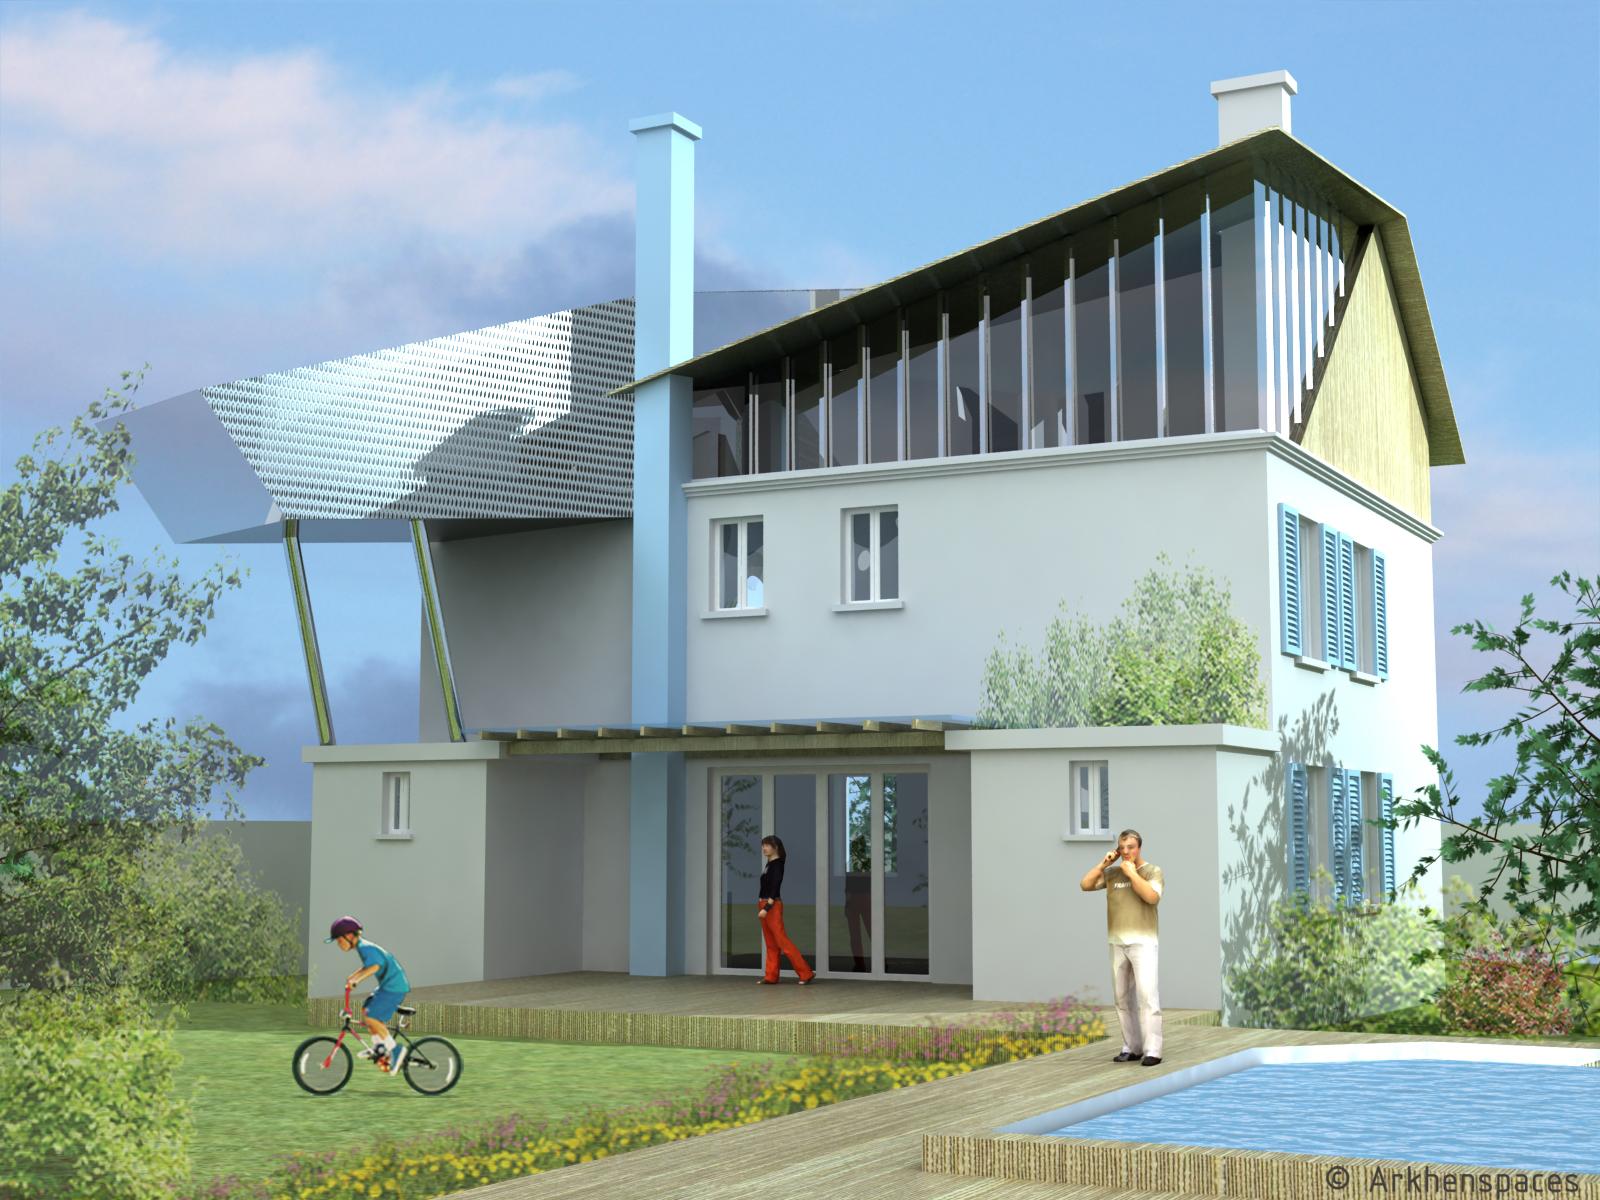 2010 2012 villa d viroflay france arkhenspaces for Piscine viroflay